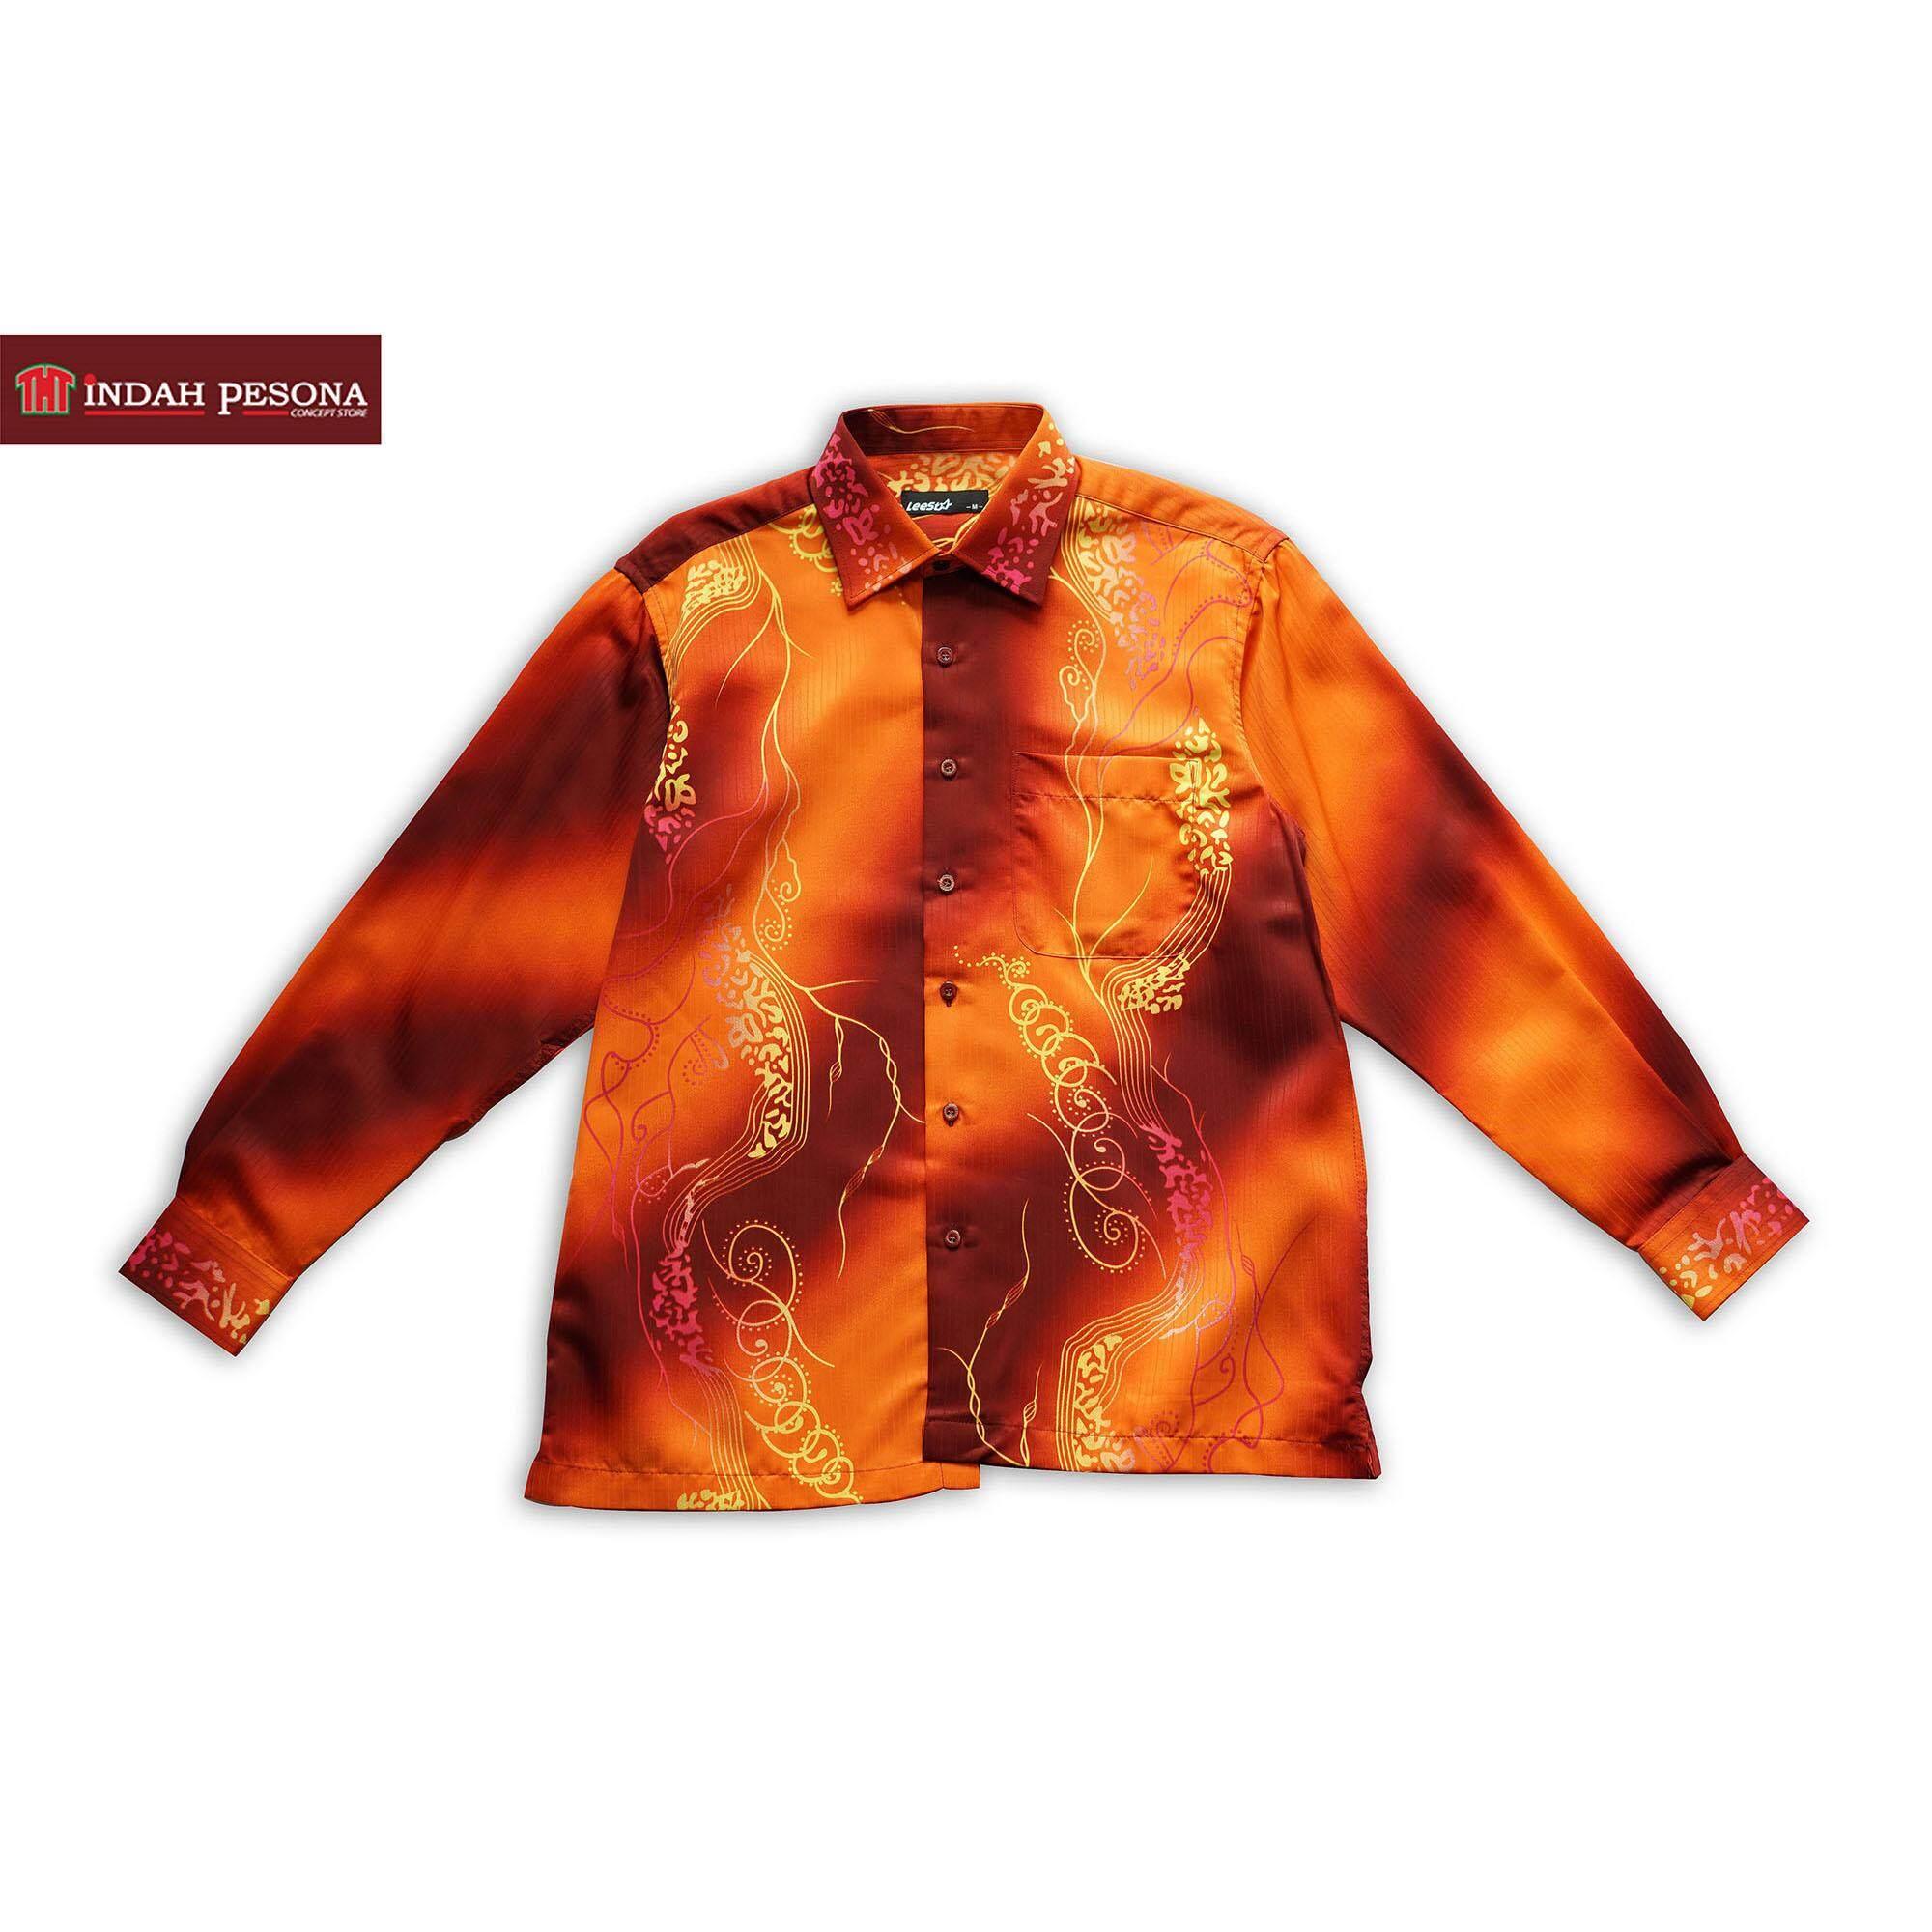 Baju Batik Lelaki Satin Color Printed Batik Shirt (Long Sleeve Shirt) 2a6fead718